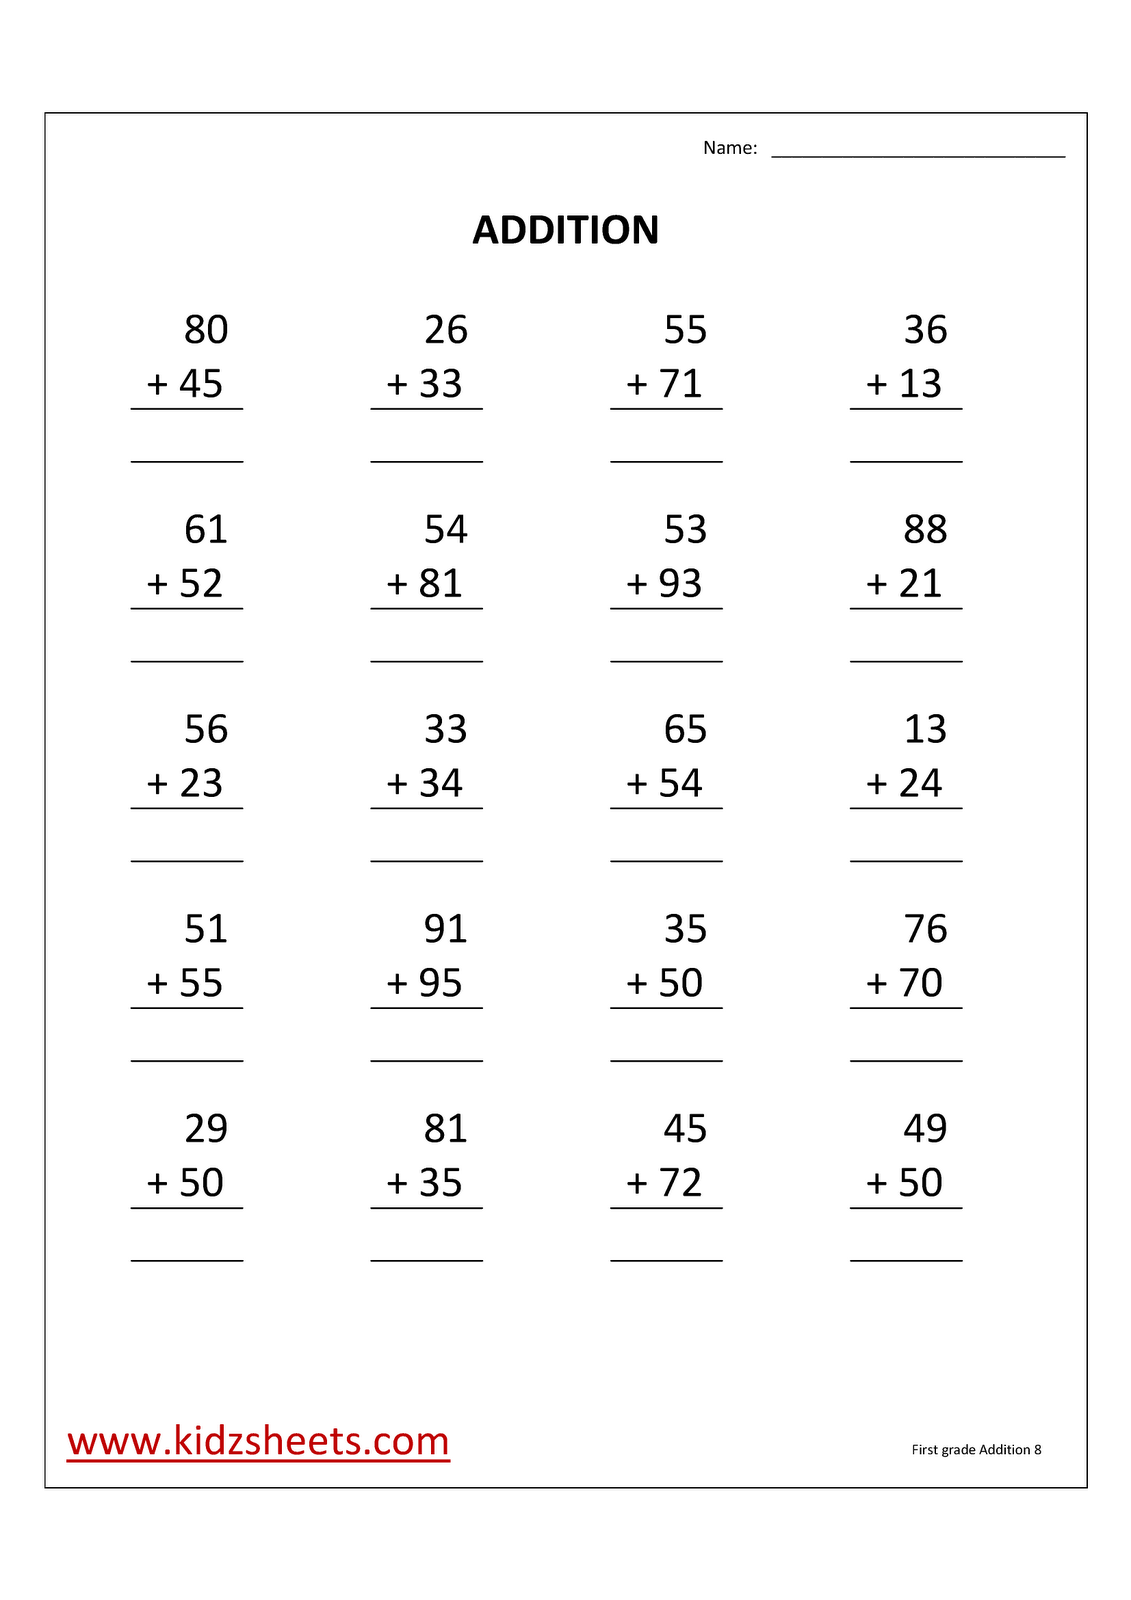 small resolution of Kidz Worksheets: First Grade Addition Worksheet8